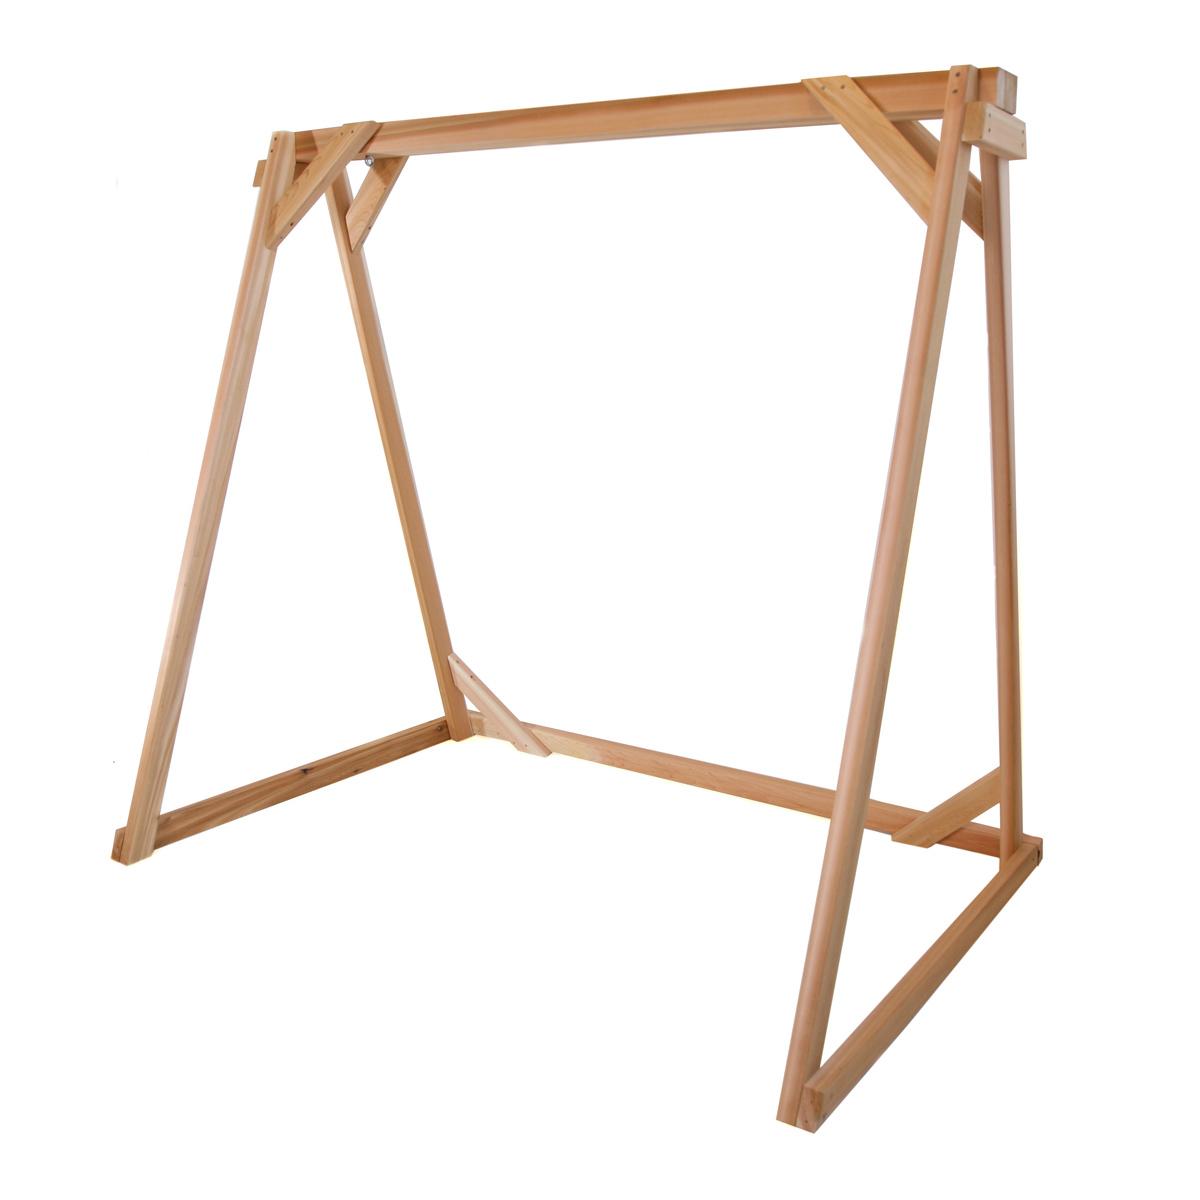 Most Recently Released 5 Ft Cedar Swings With Springs Regarding Cedar Garden A Frame Swing Setall Things Cedar (View 21 of 25)